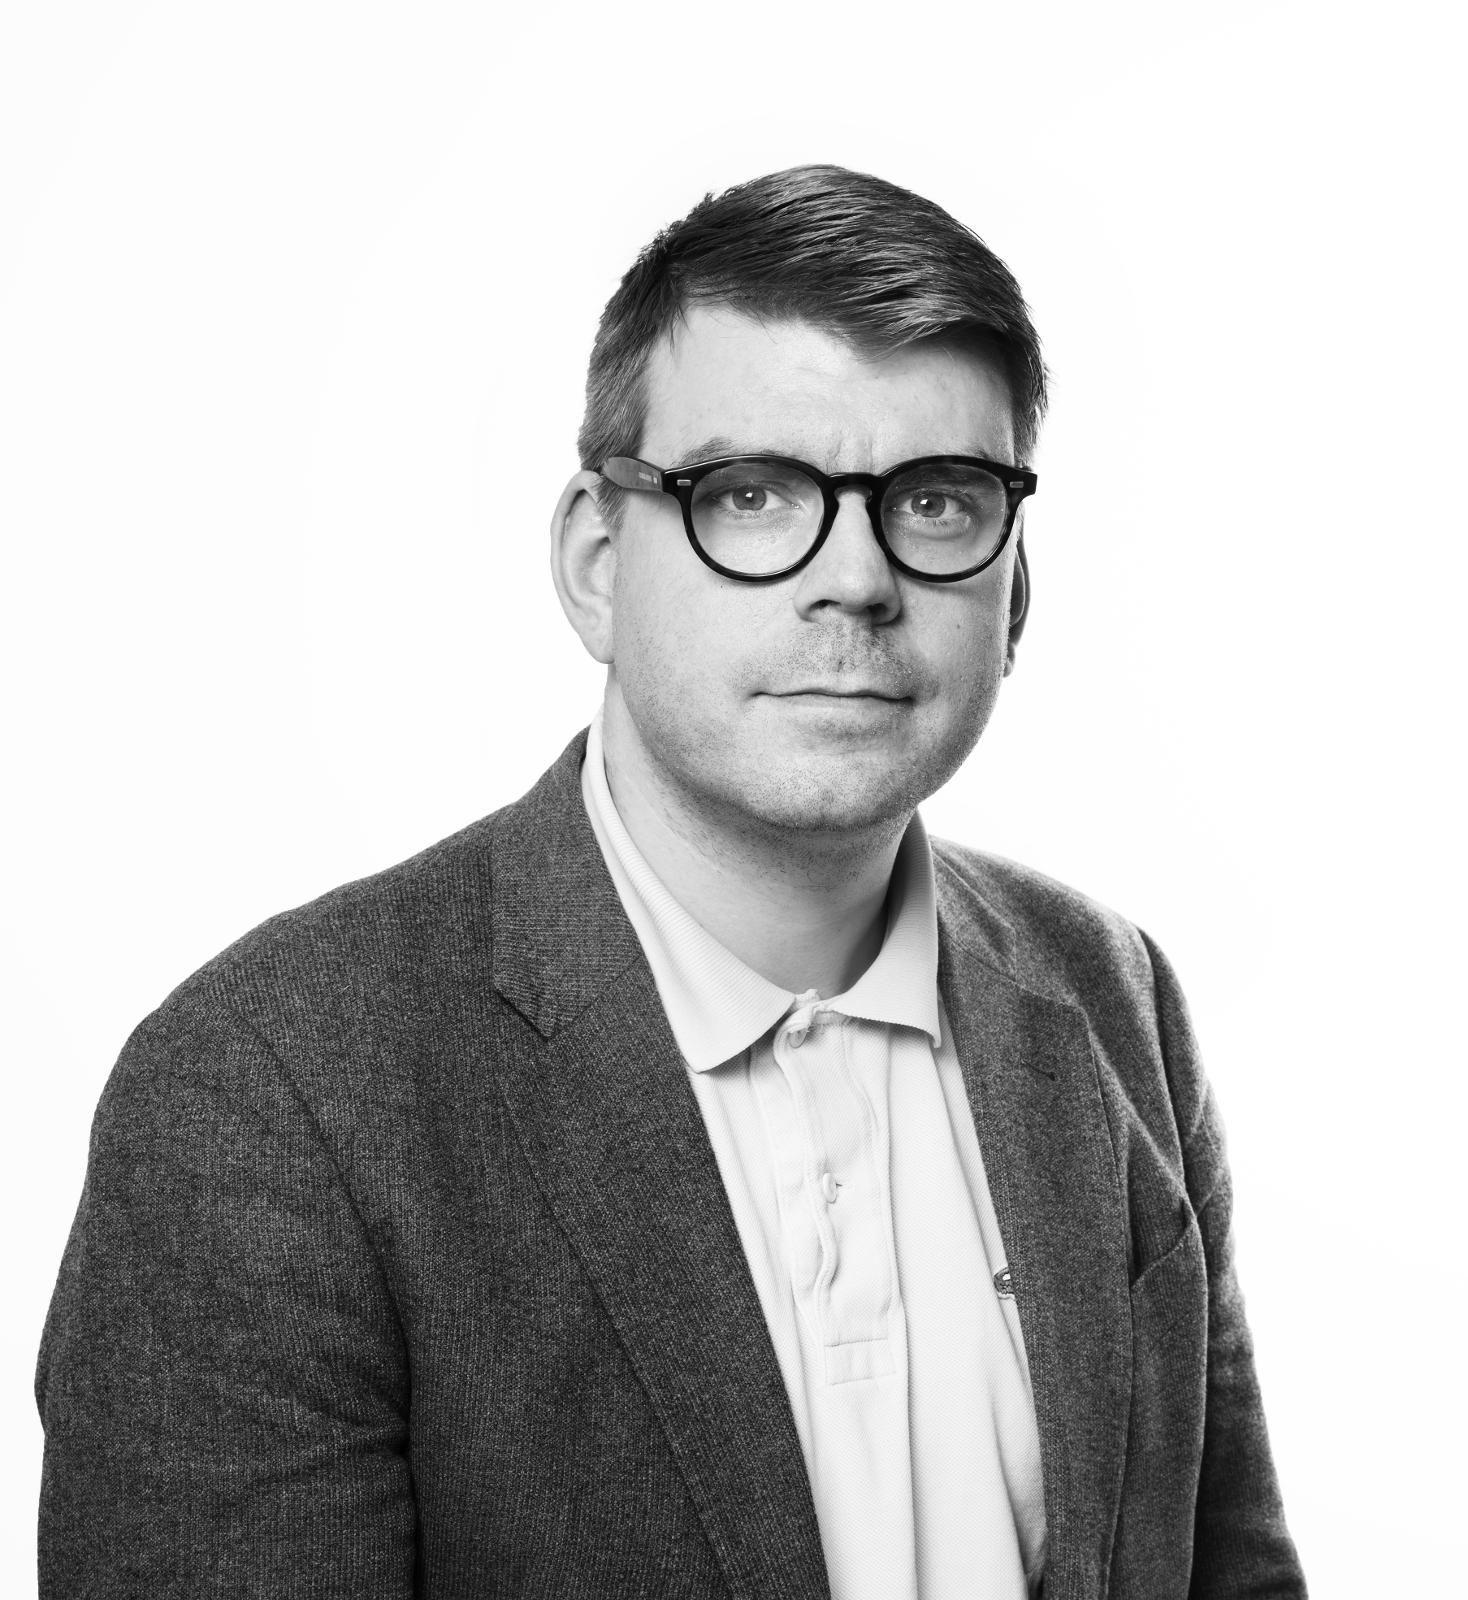 Sigvald Sveinbjørnsson